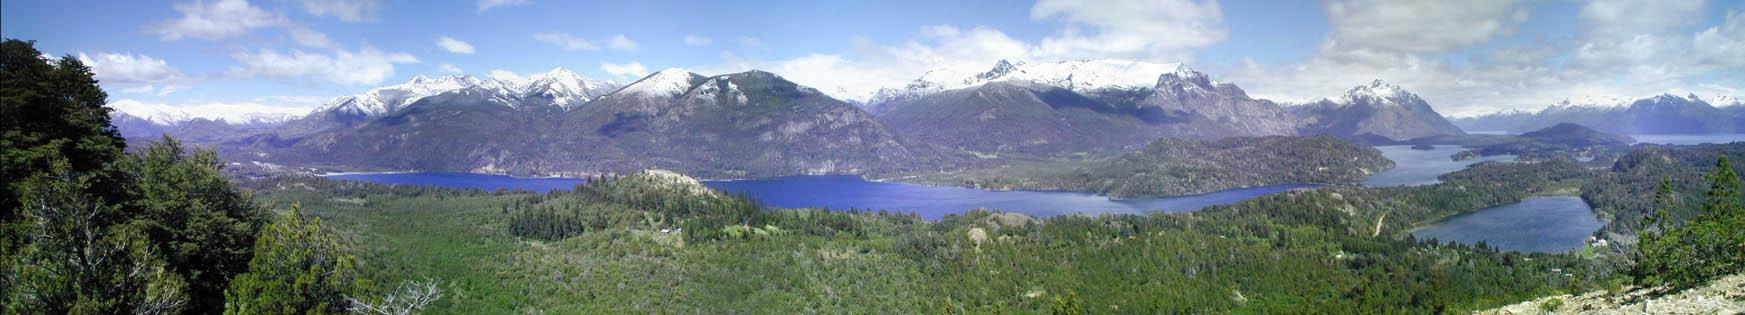 Bariloche-11-2003.jpg